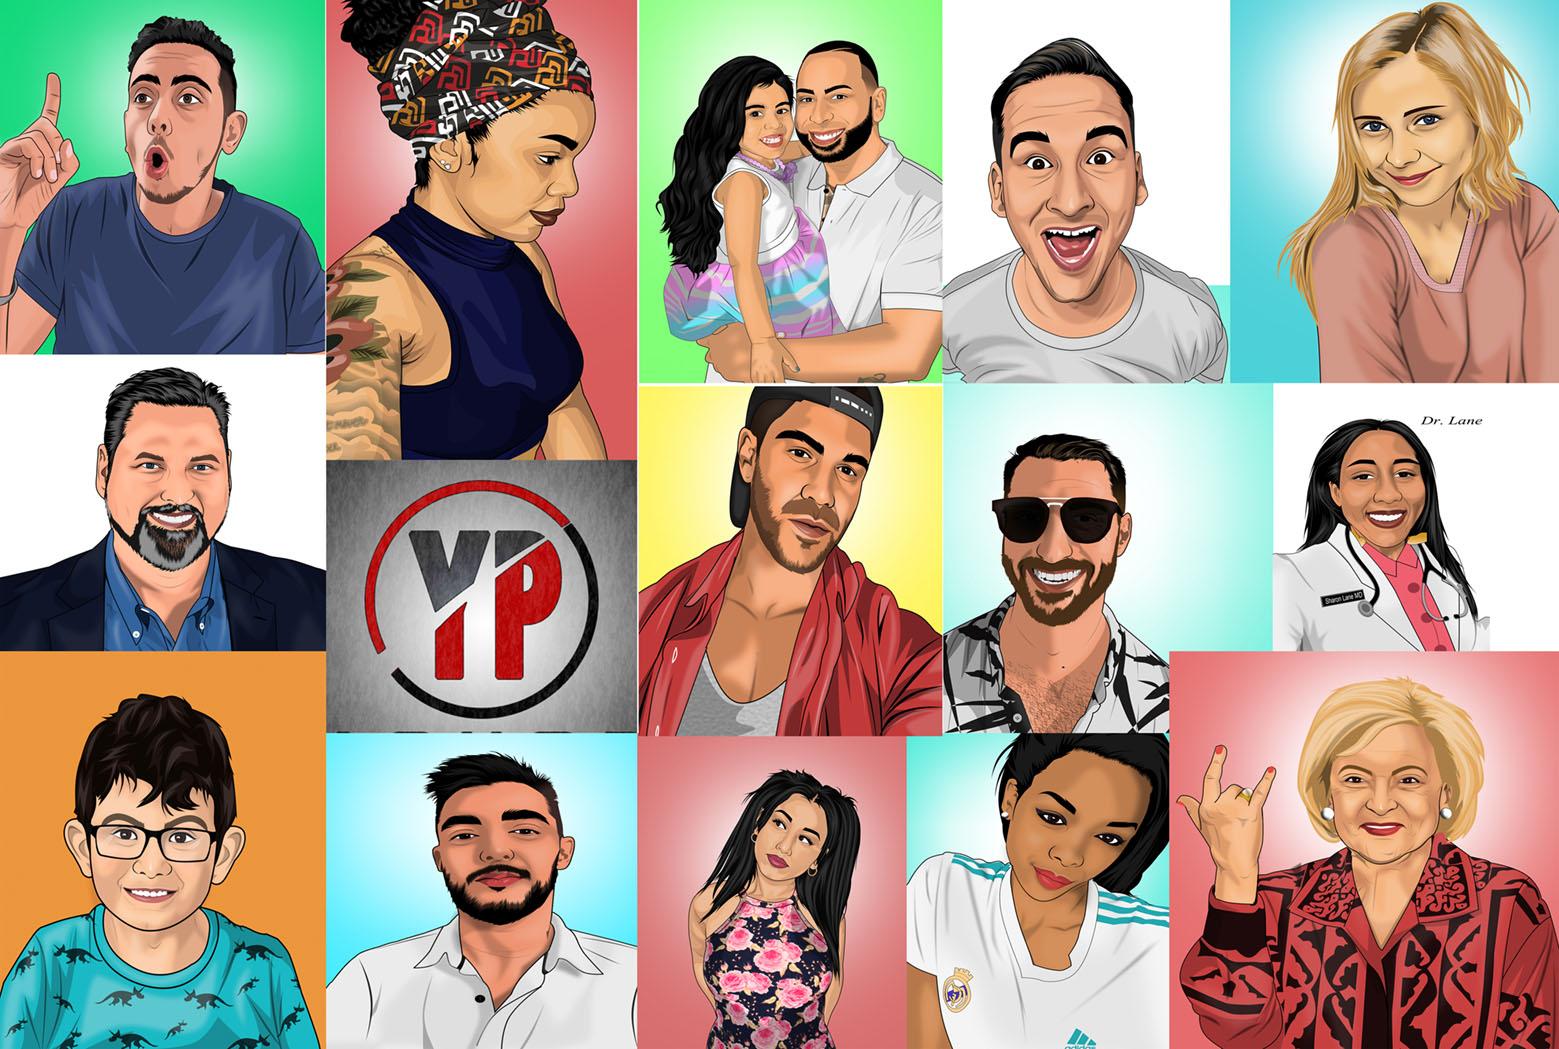 Make your picture into a cartoon portrait